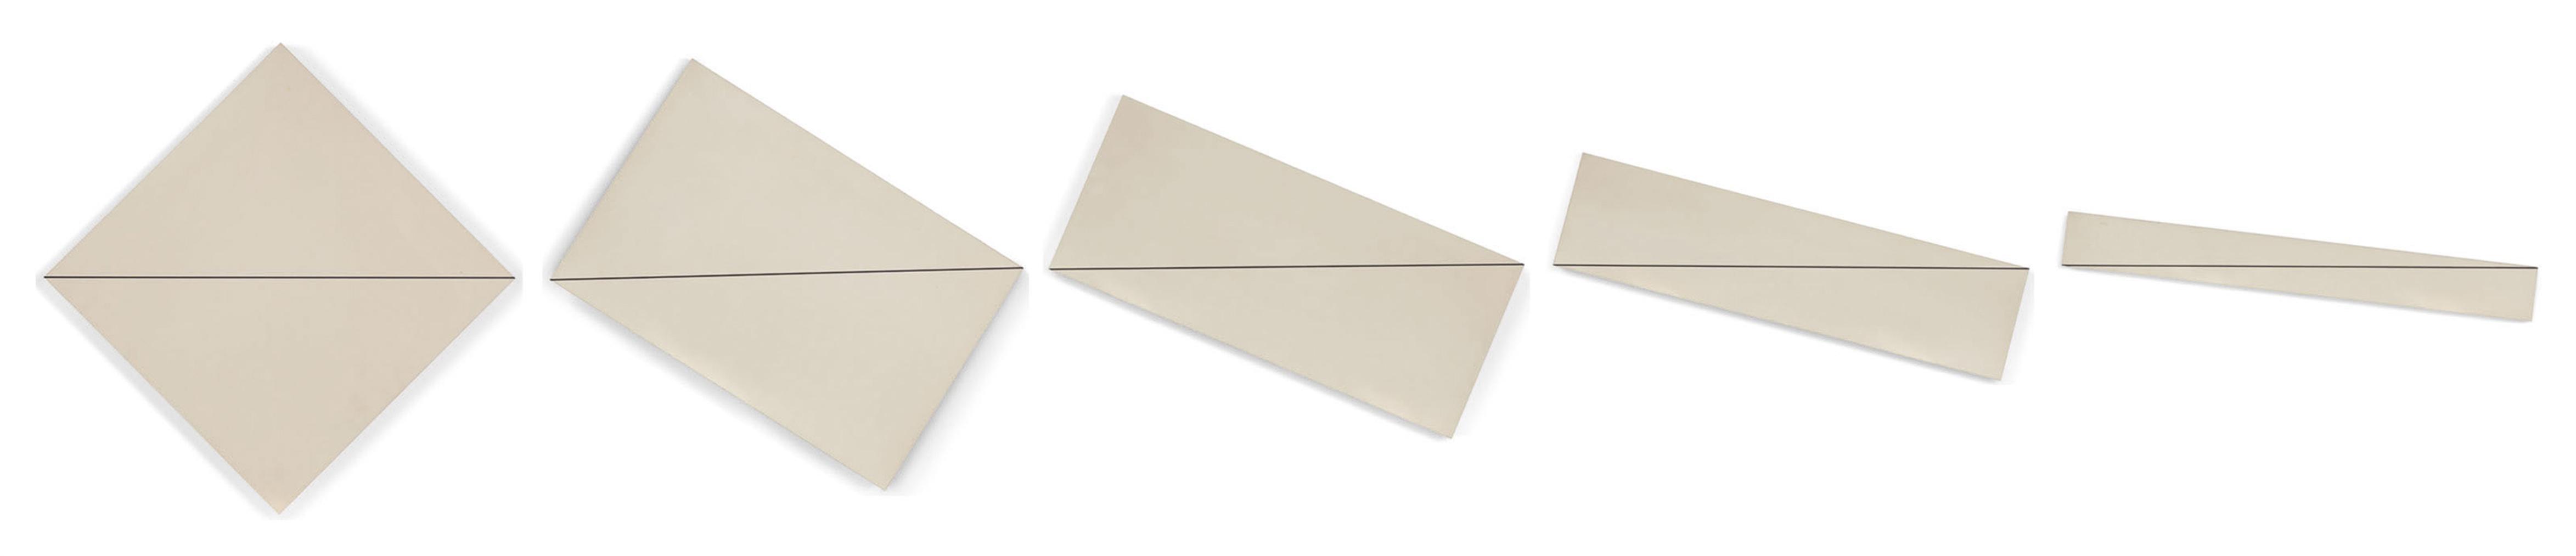 Francois Morellet-Diagonale-Horizontale (Diagonal-Horizontal)-1975